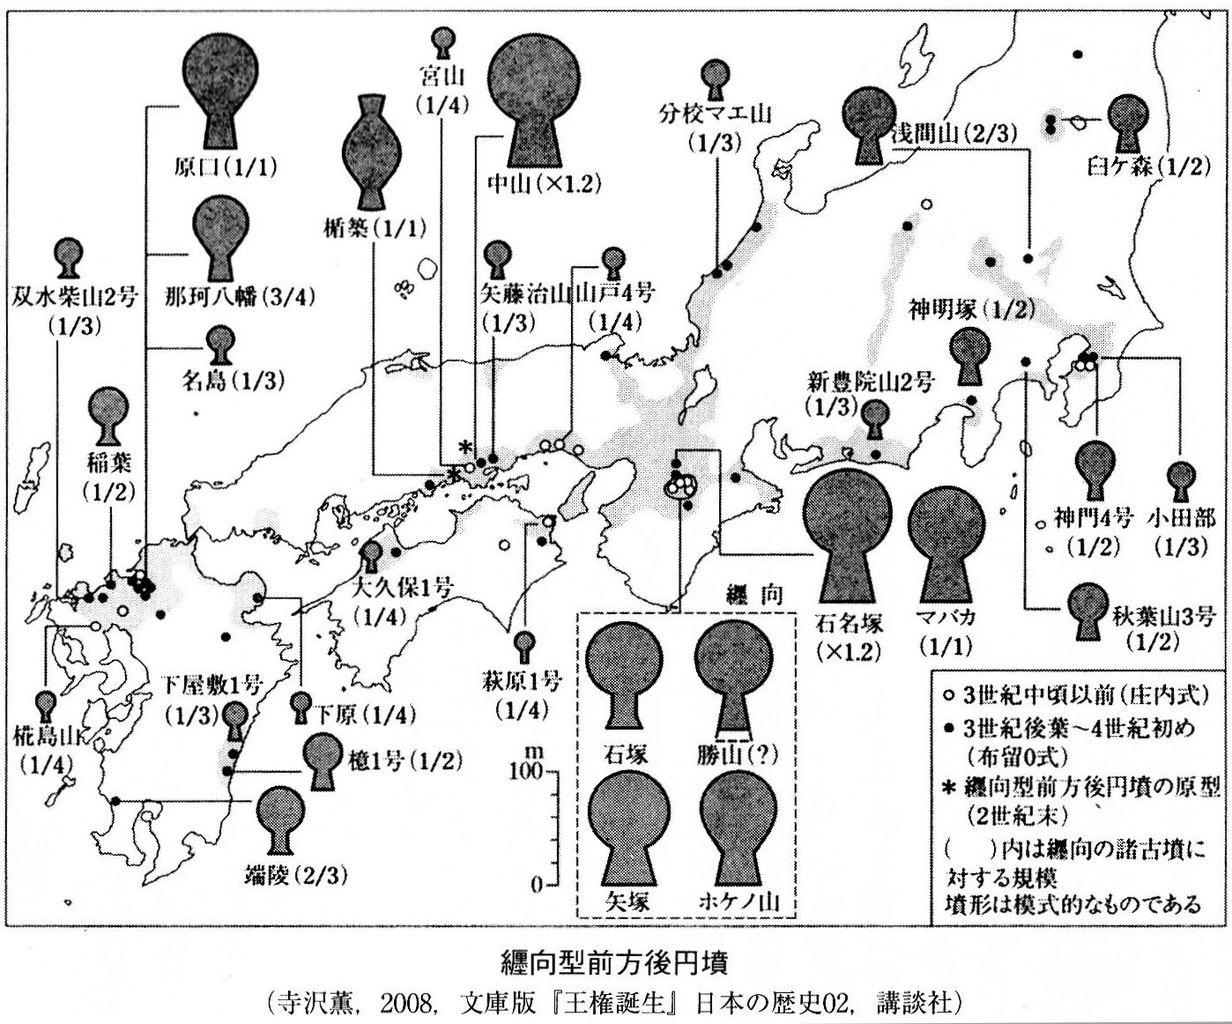 http://livedoor.blogimg.jp/buccyake_kojiki/imgs/2/4/245c6ce0.jpg